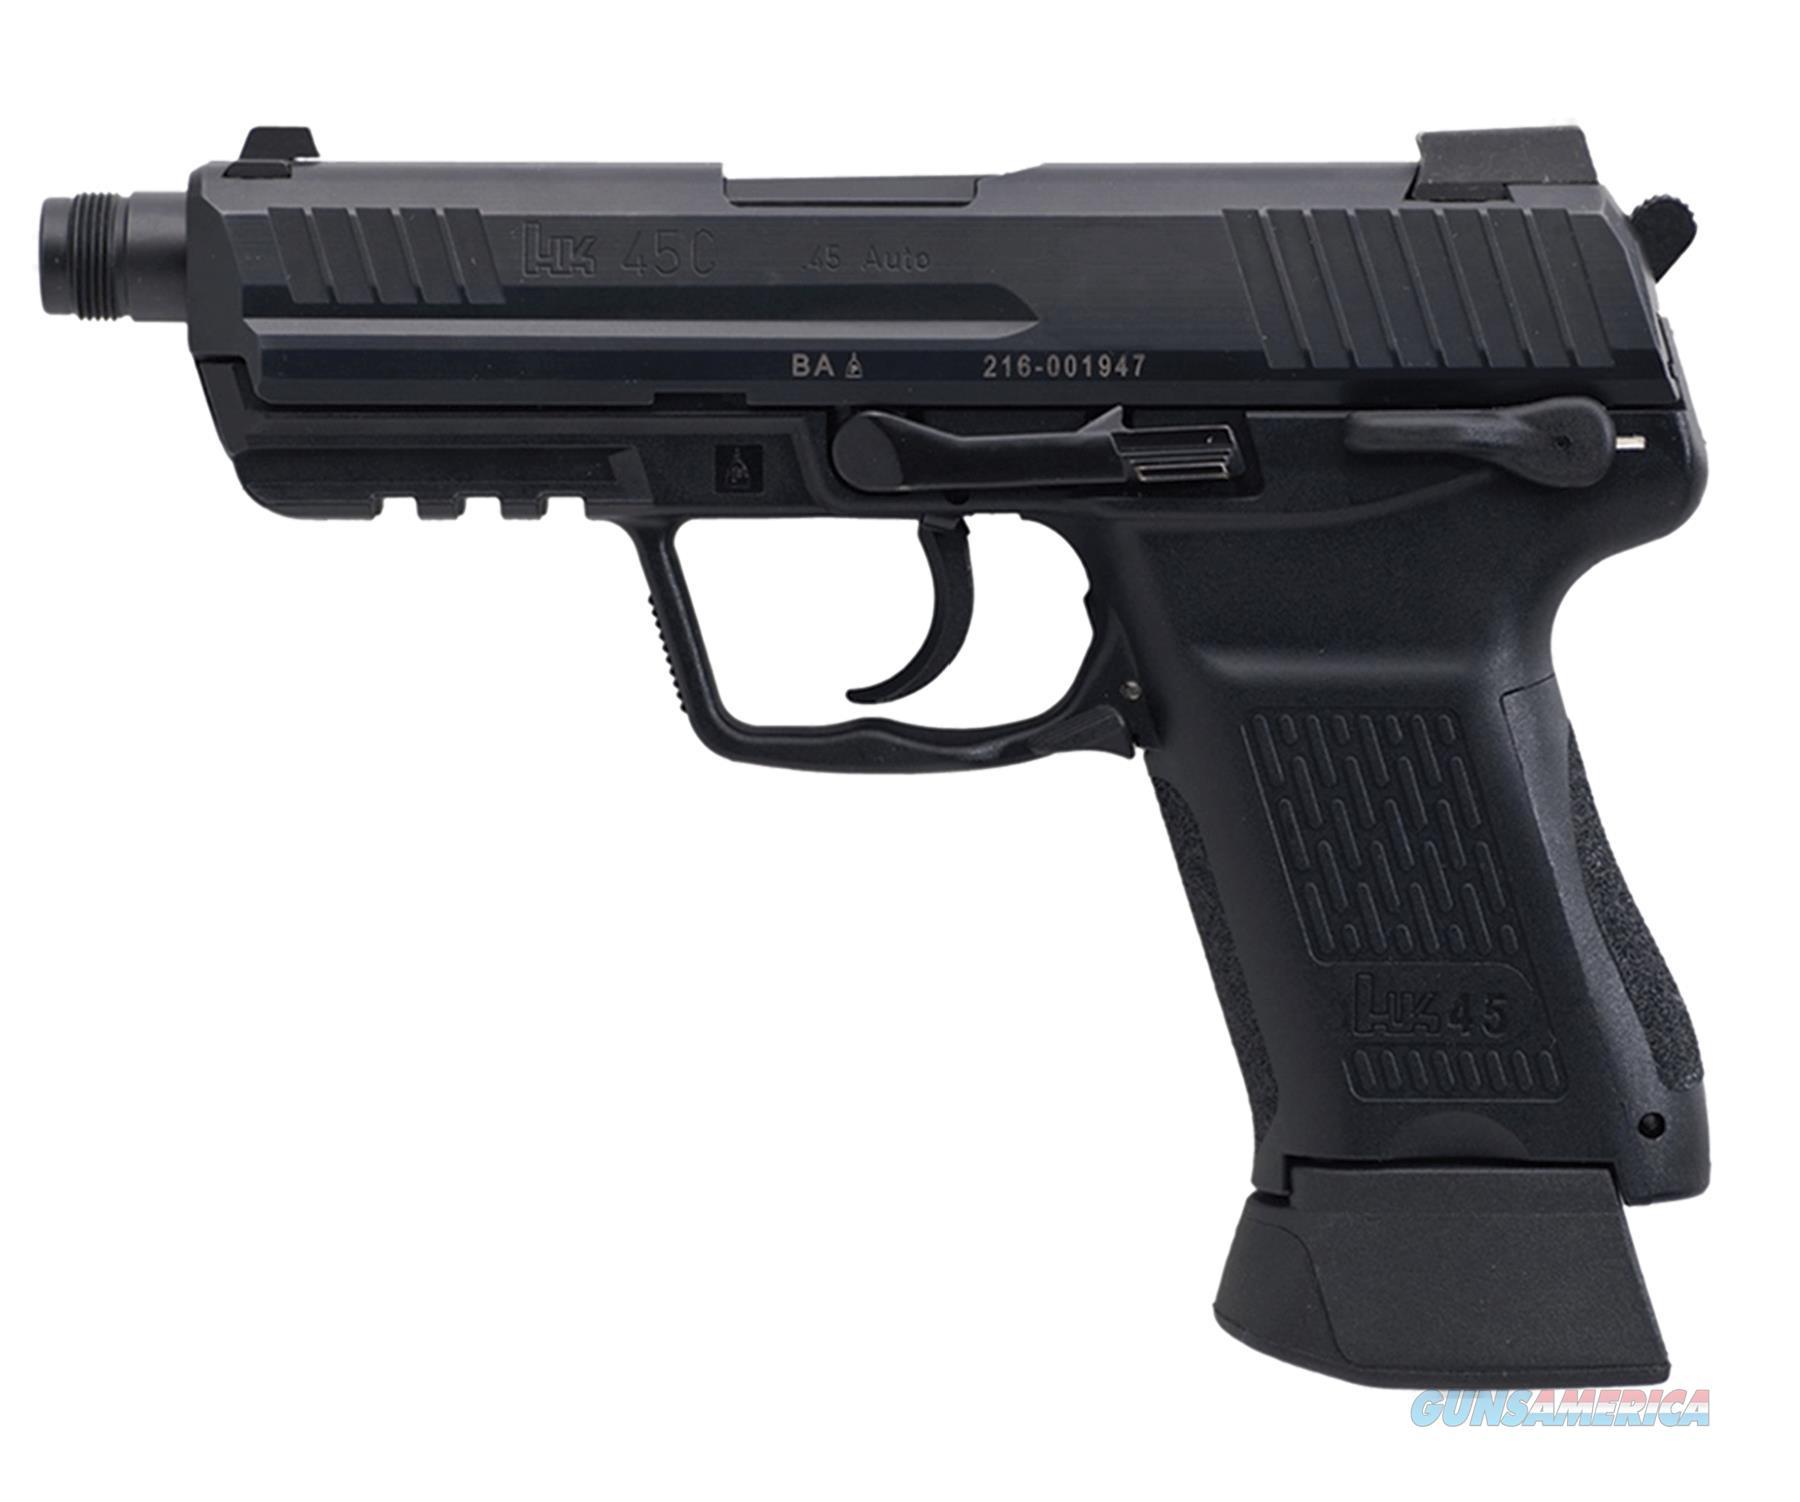 "Heckler & Koch 745037Ta5 Heckler & Koch45ct Comp Tactical V7 Double Lem 45 Acp Nms 4.57"" 10+1 3Dot Ns Blk Syn Grip Blk 745037TA5  Guns > Pistols > H Misc Pistols"